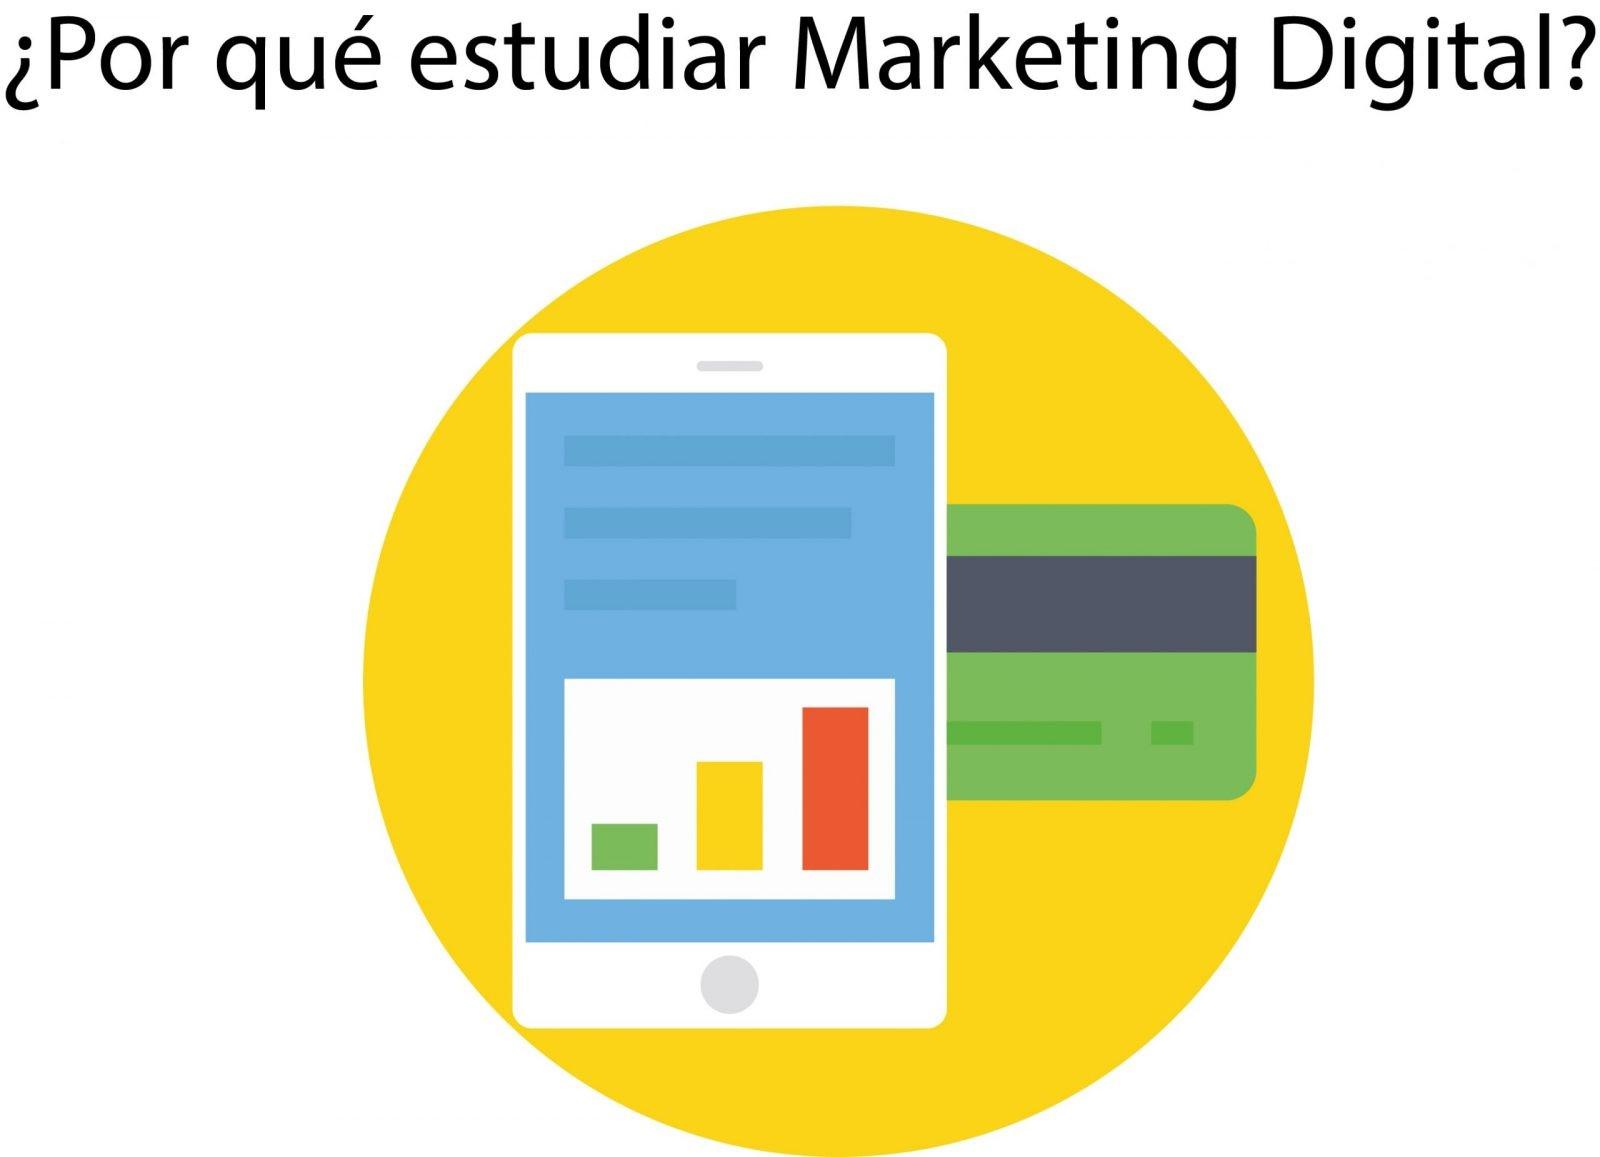 por que estudiar Marketing Digital